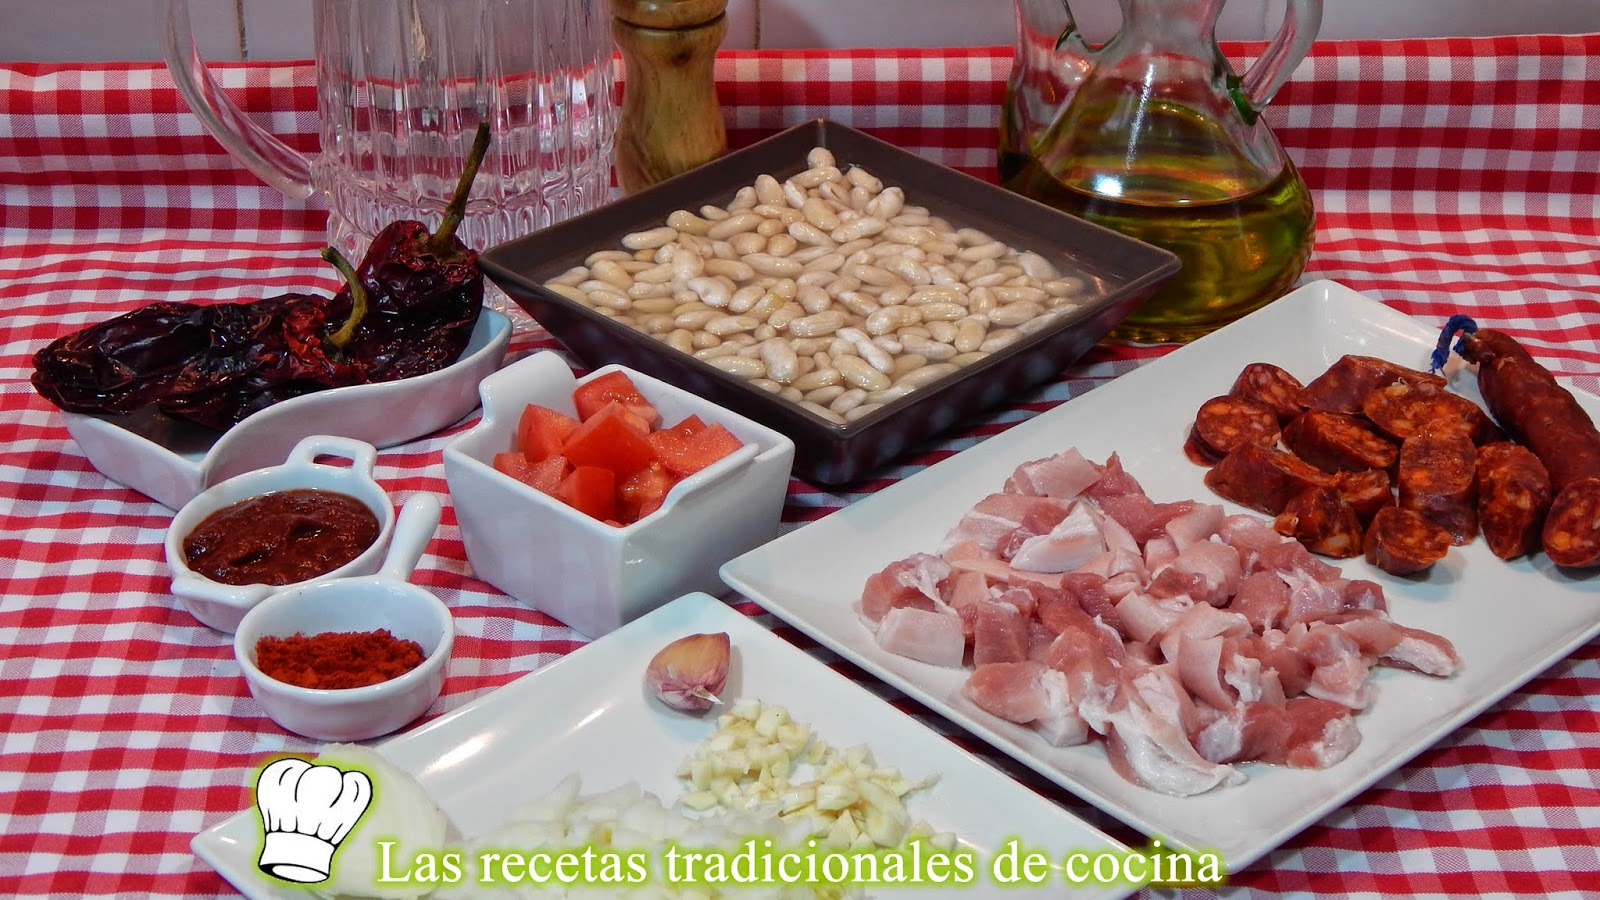 Receta fácil de alubias a la Riojana